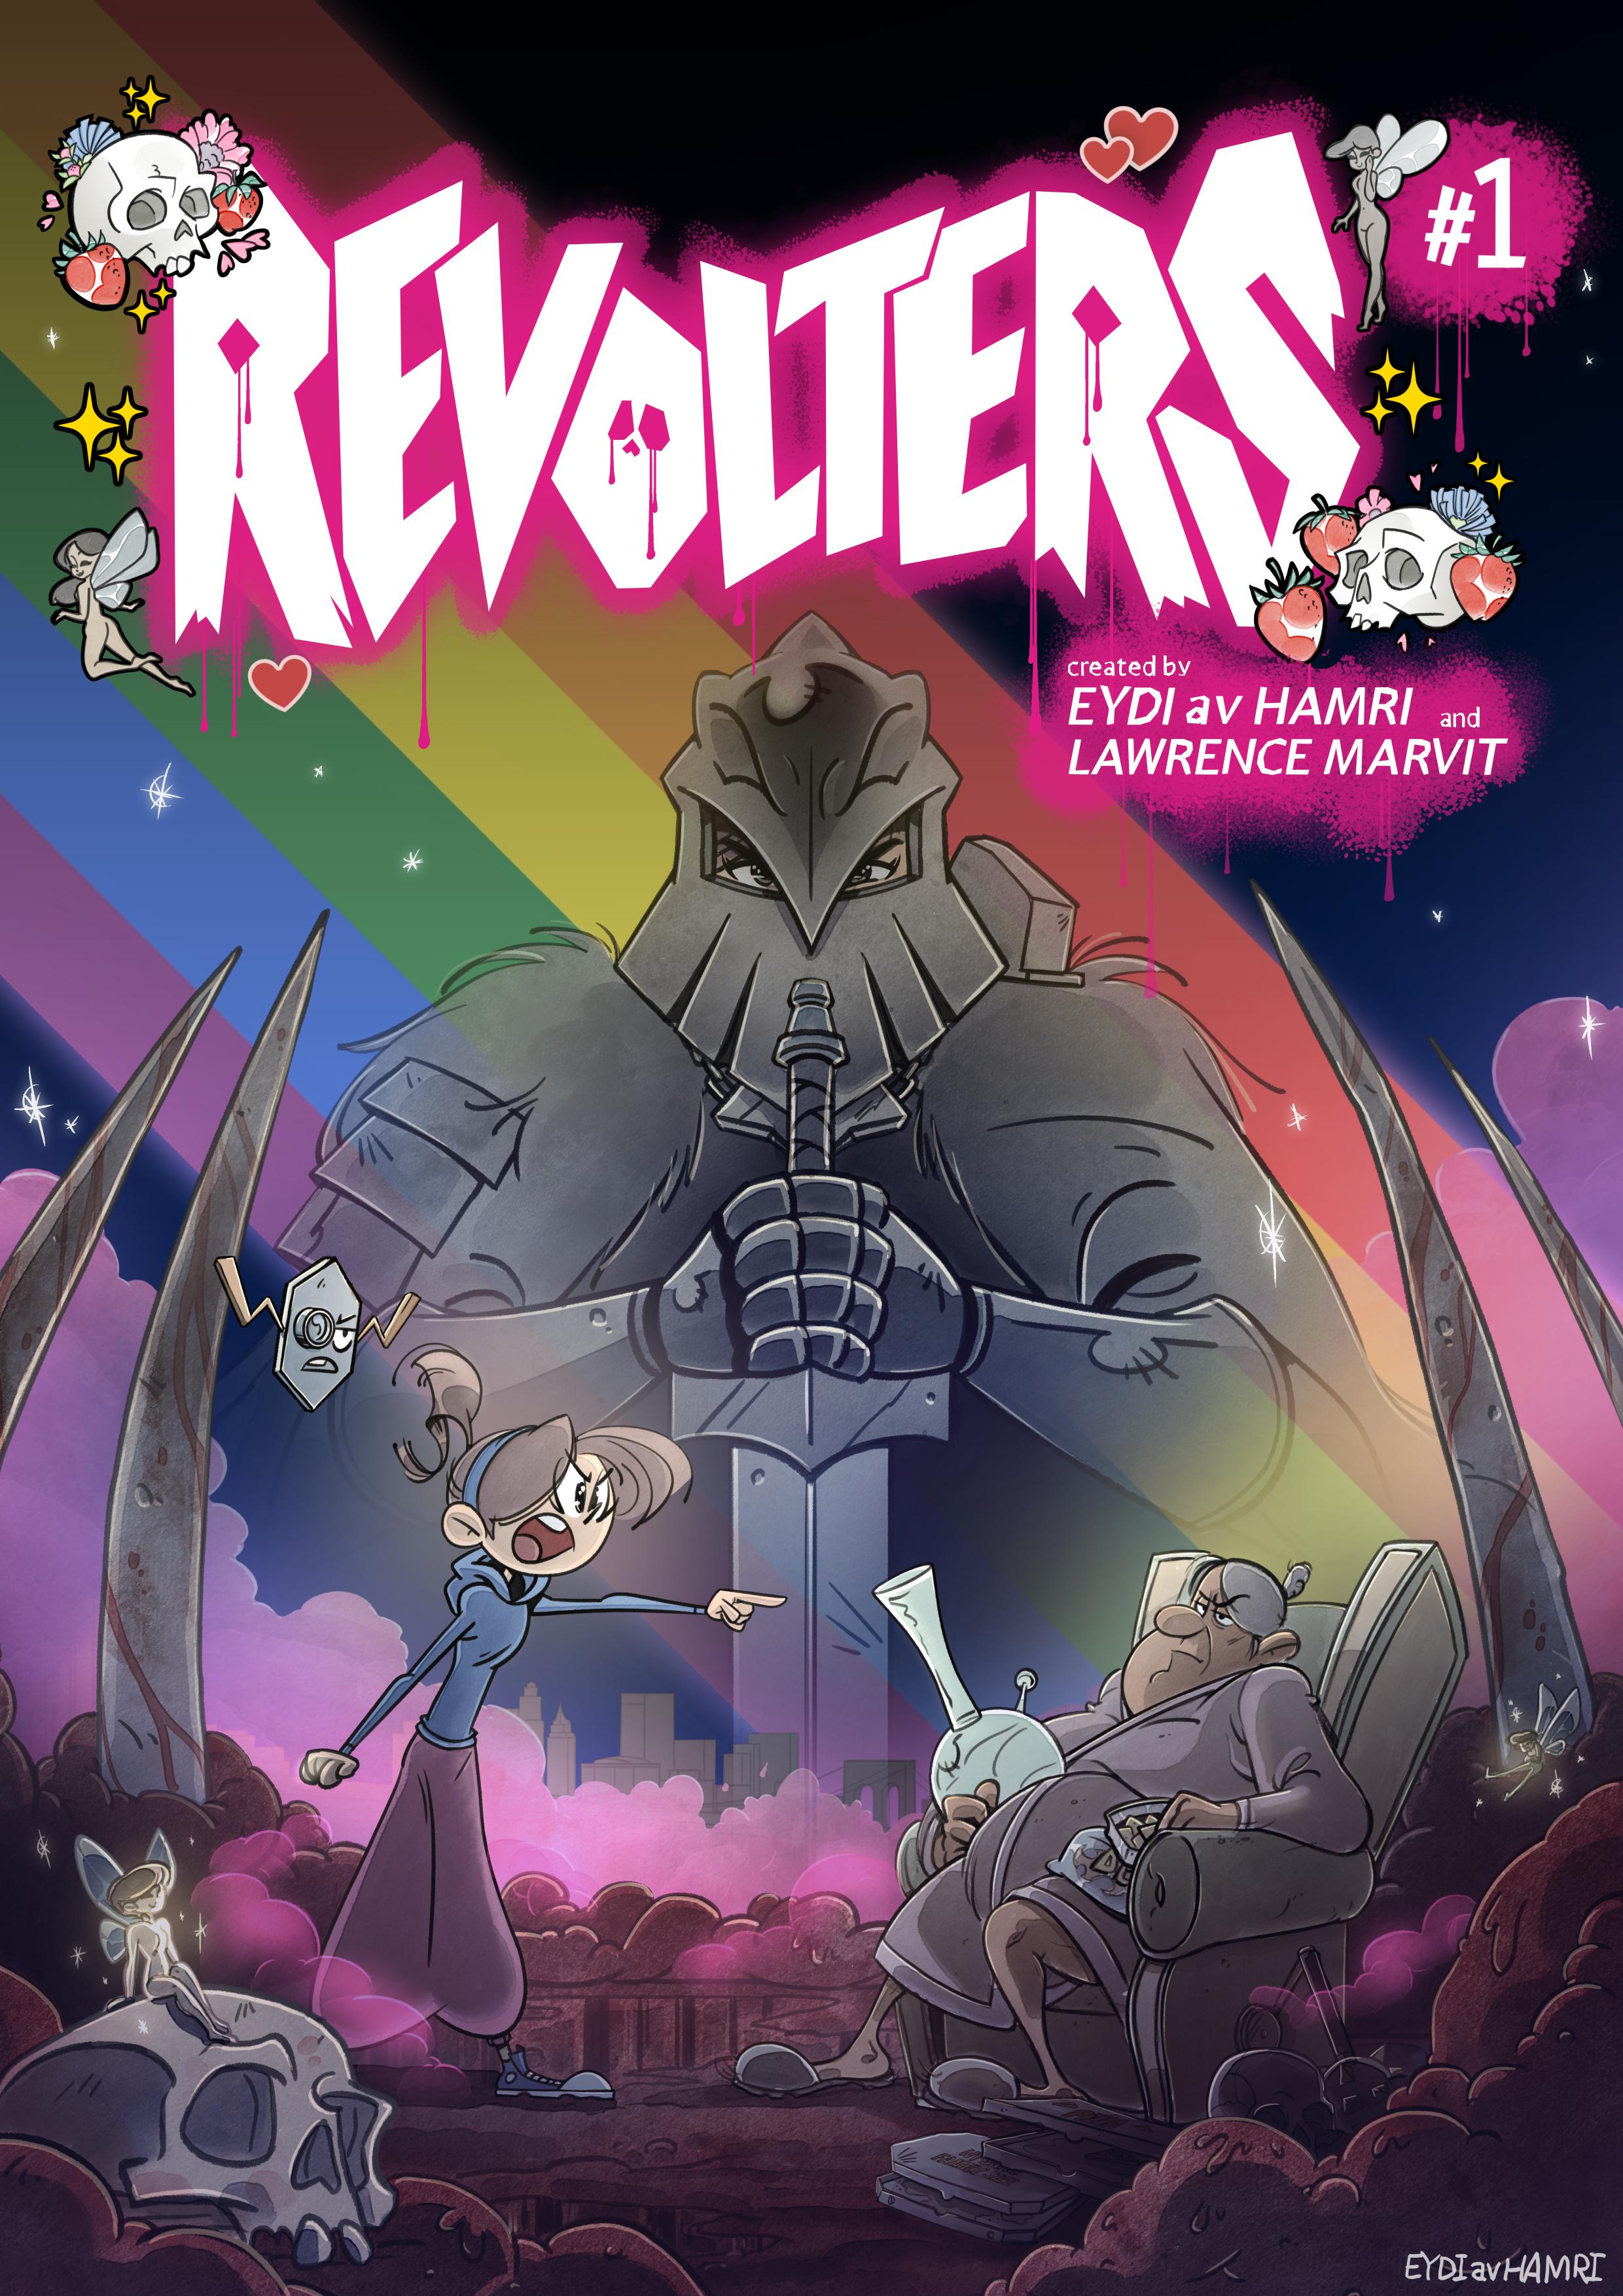 Revolters #1 (1-4 / 43)